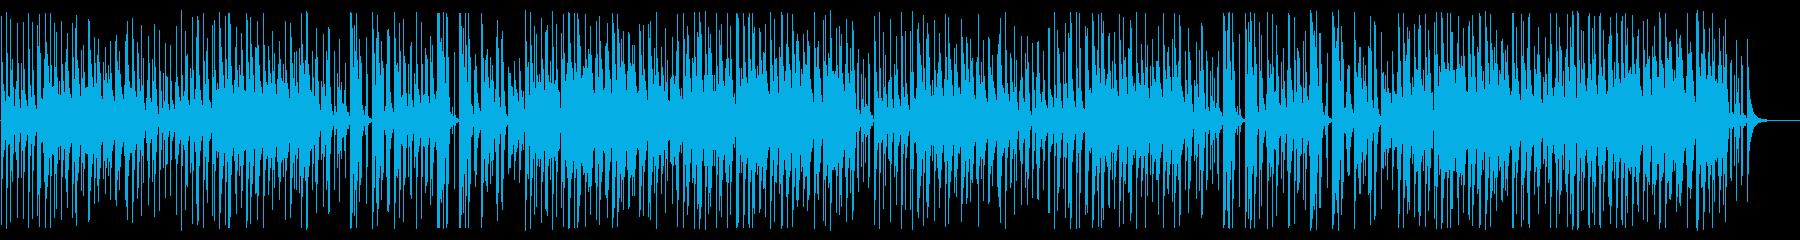 YouTube 爽やかな優しいウクレレの再生済みの波形